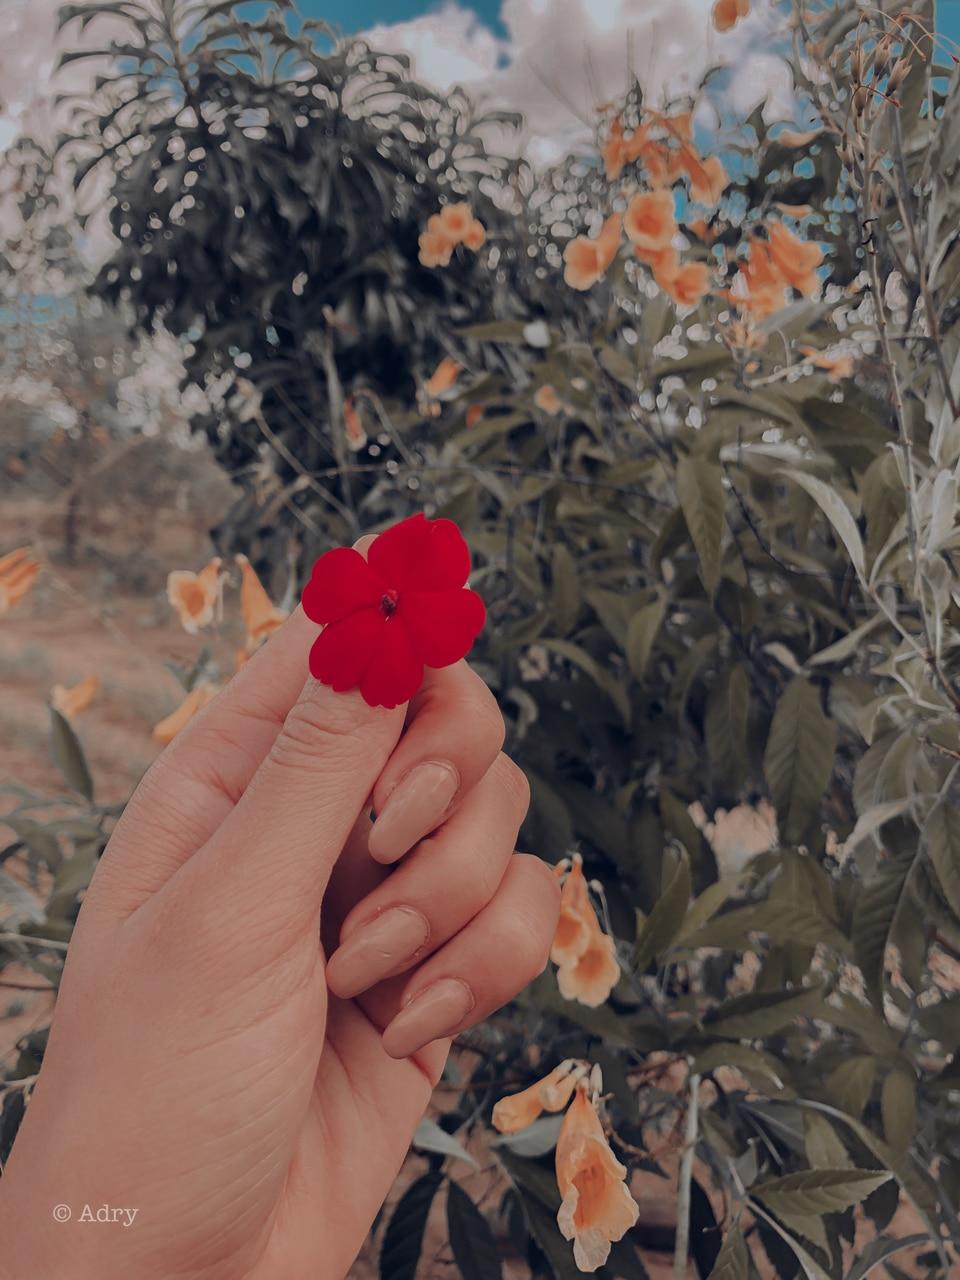 flourish and inspiration image